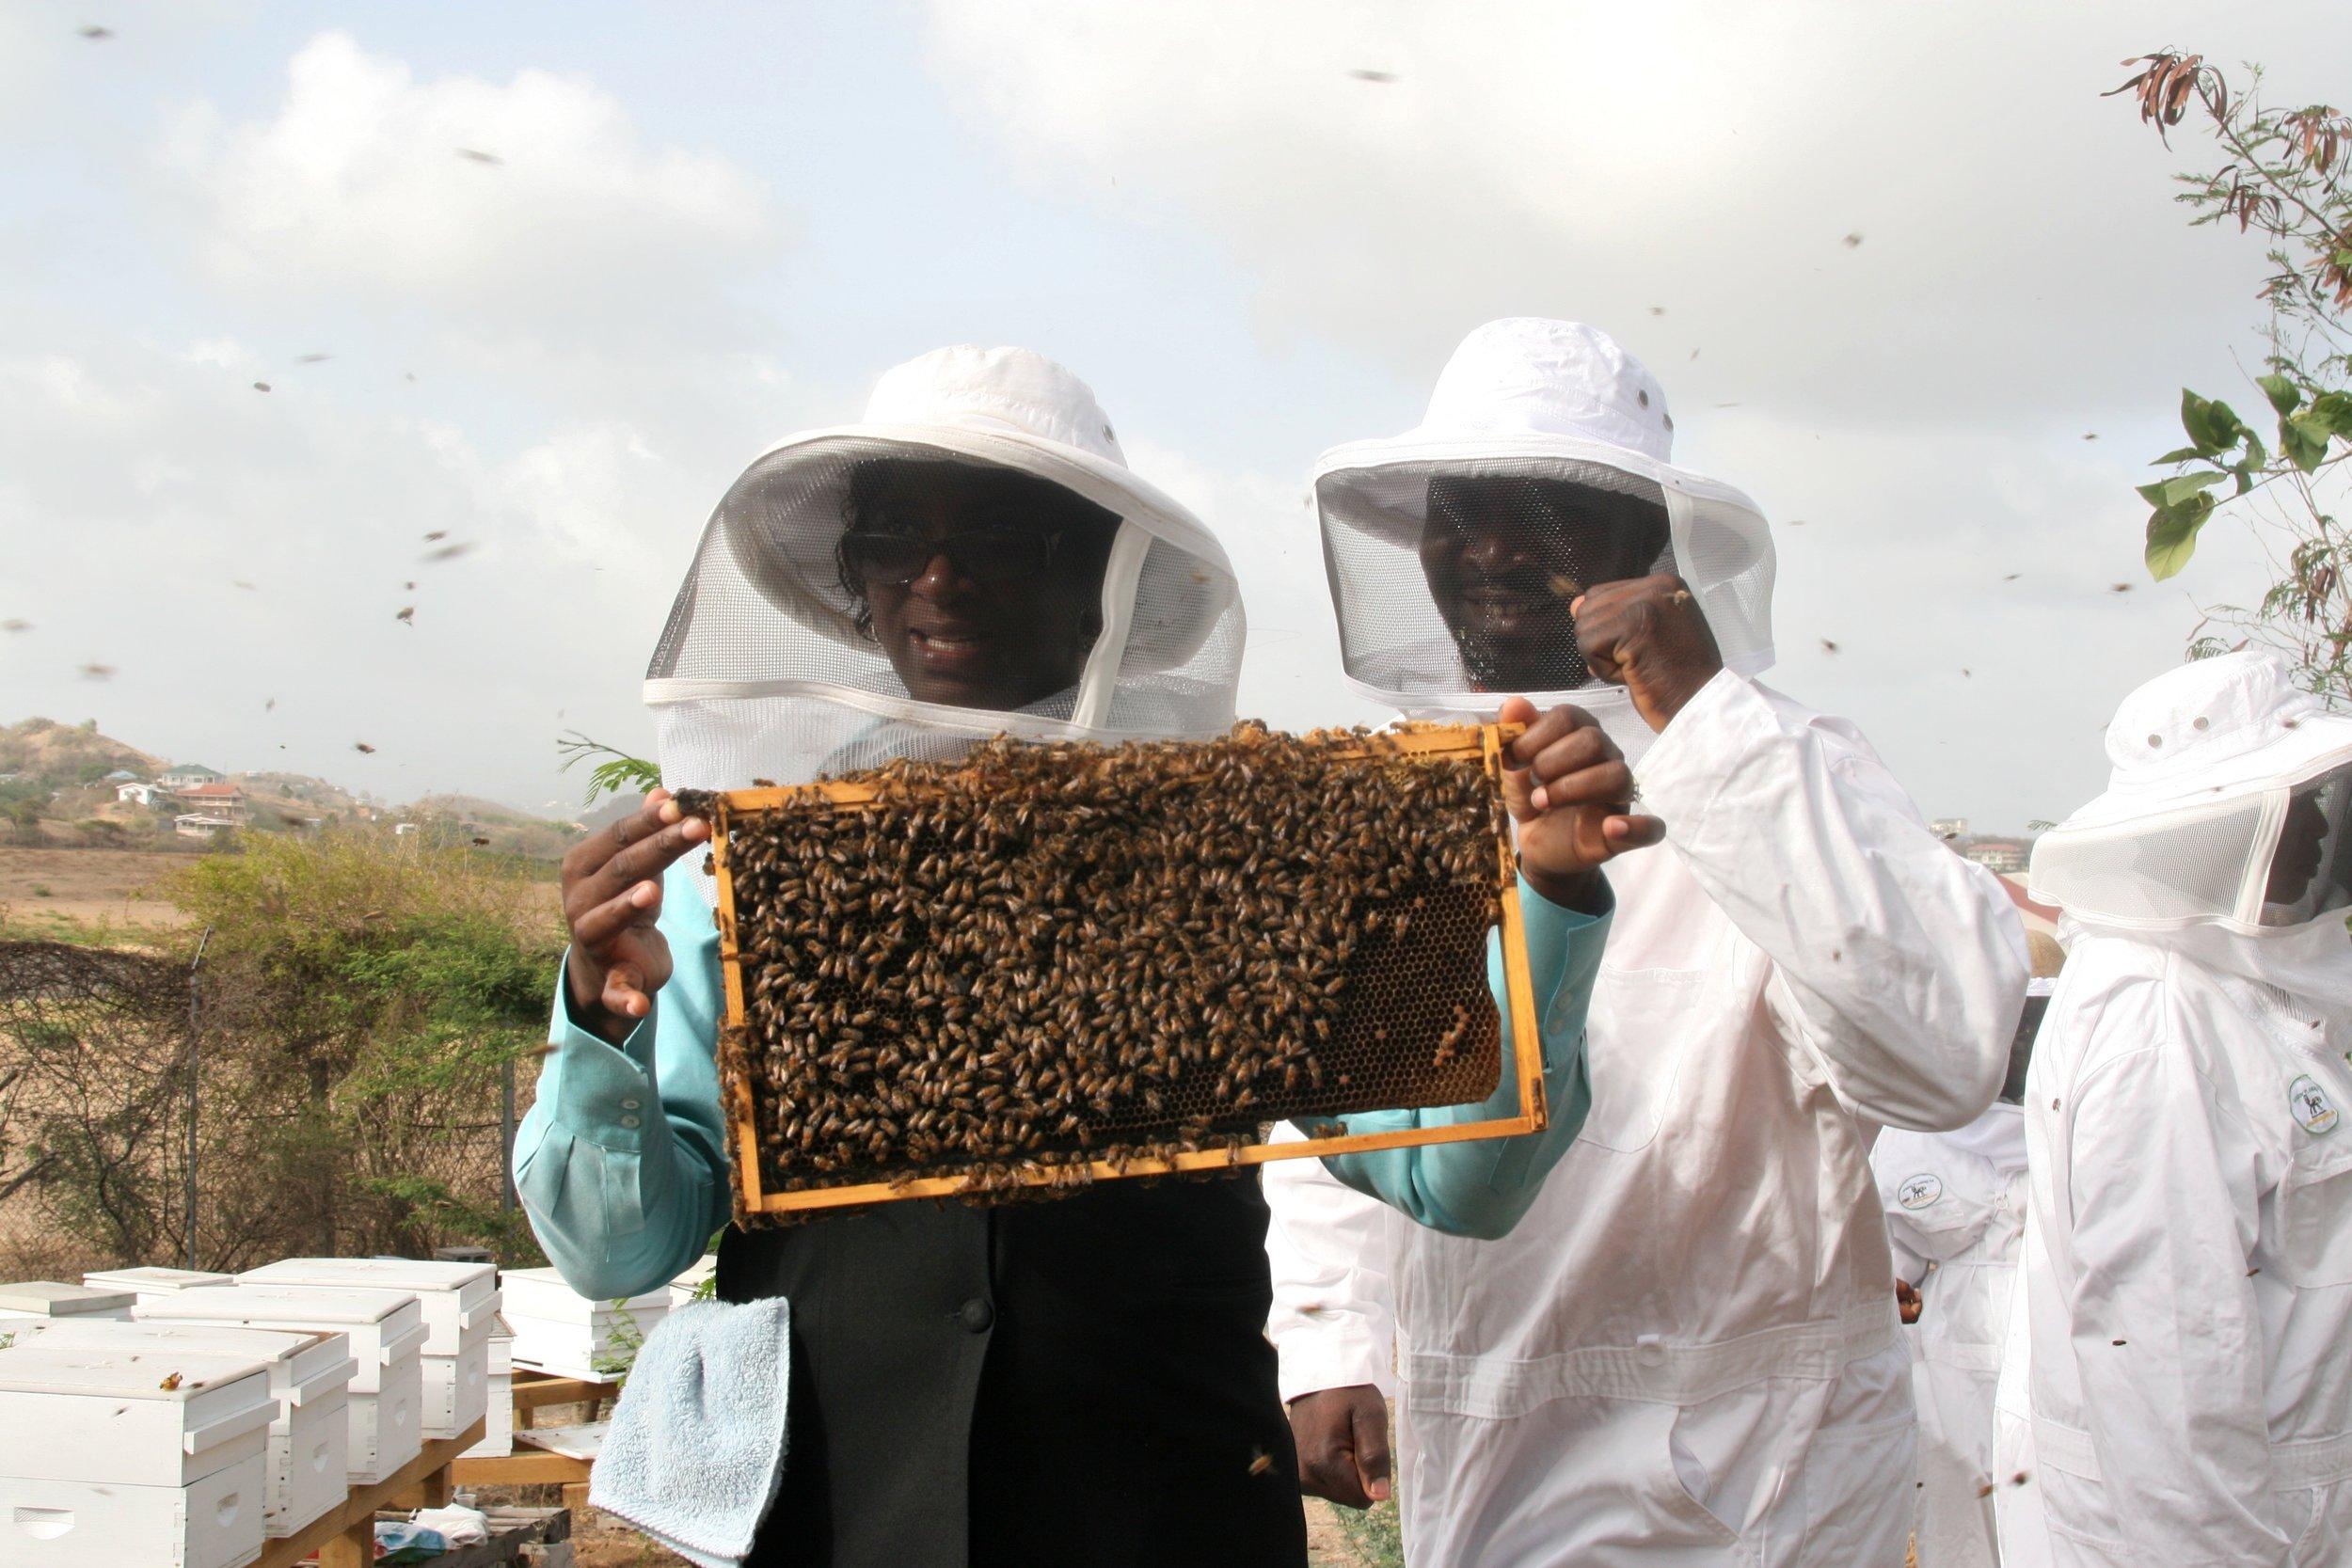 Grenada Woman Man frame bees.jpg